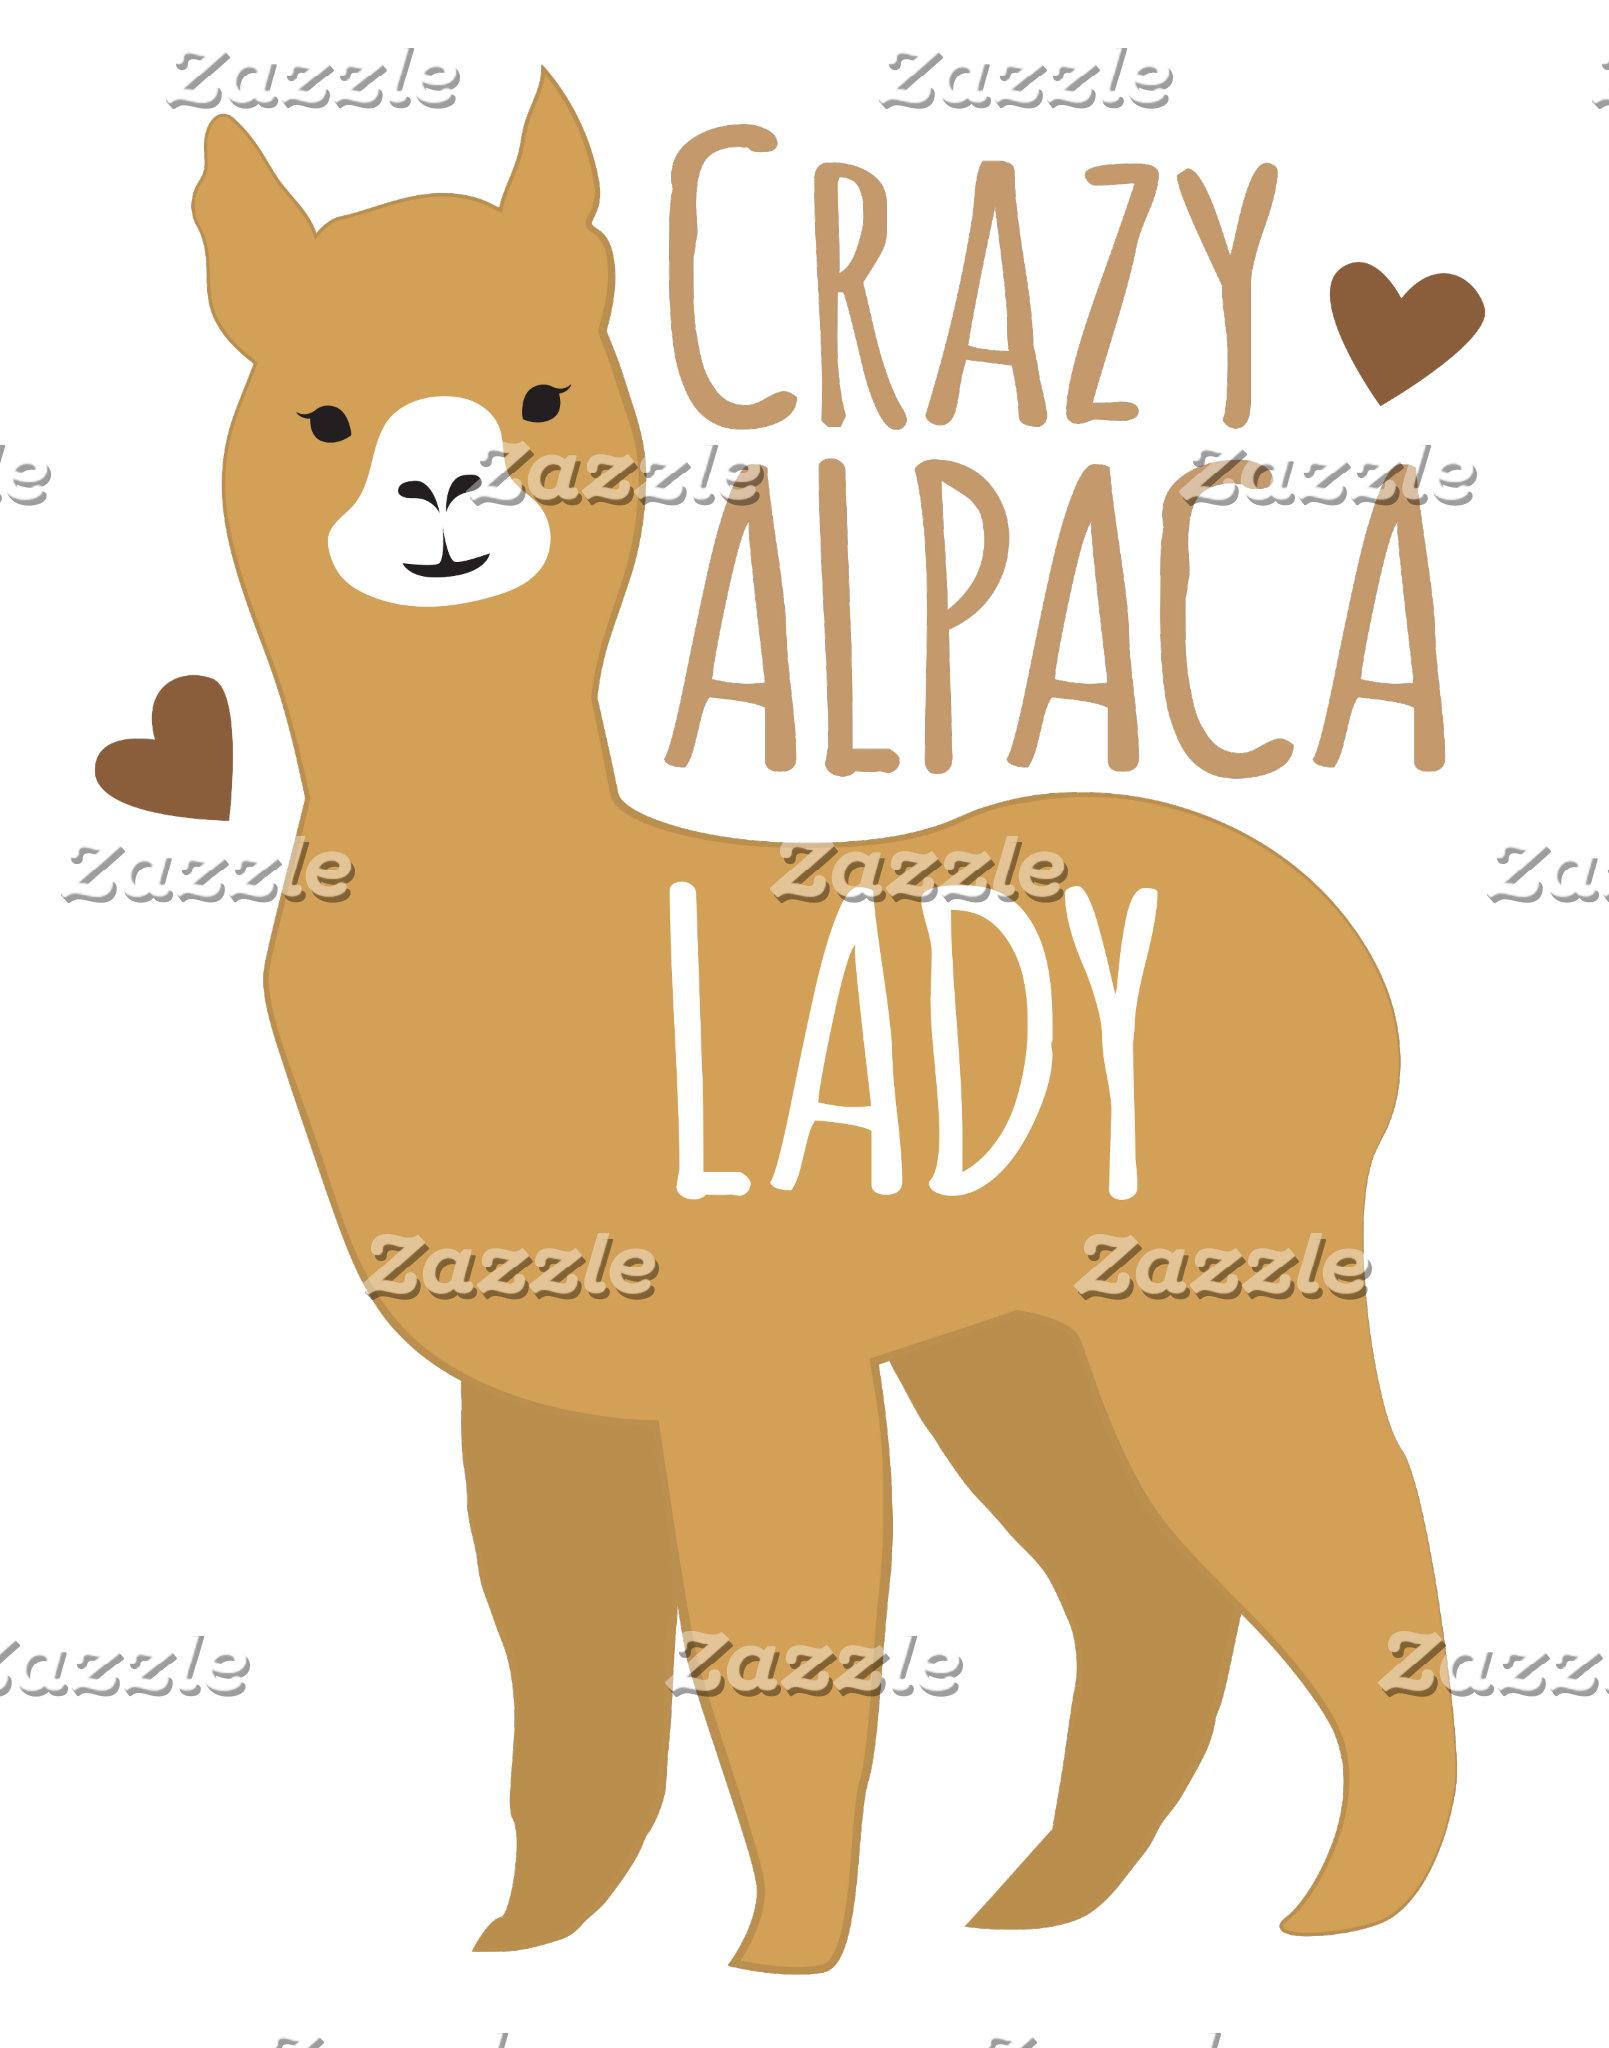 Crazy alpaca lady